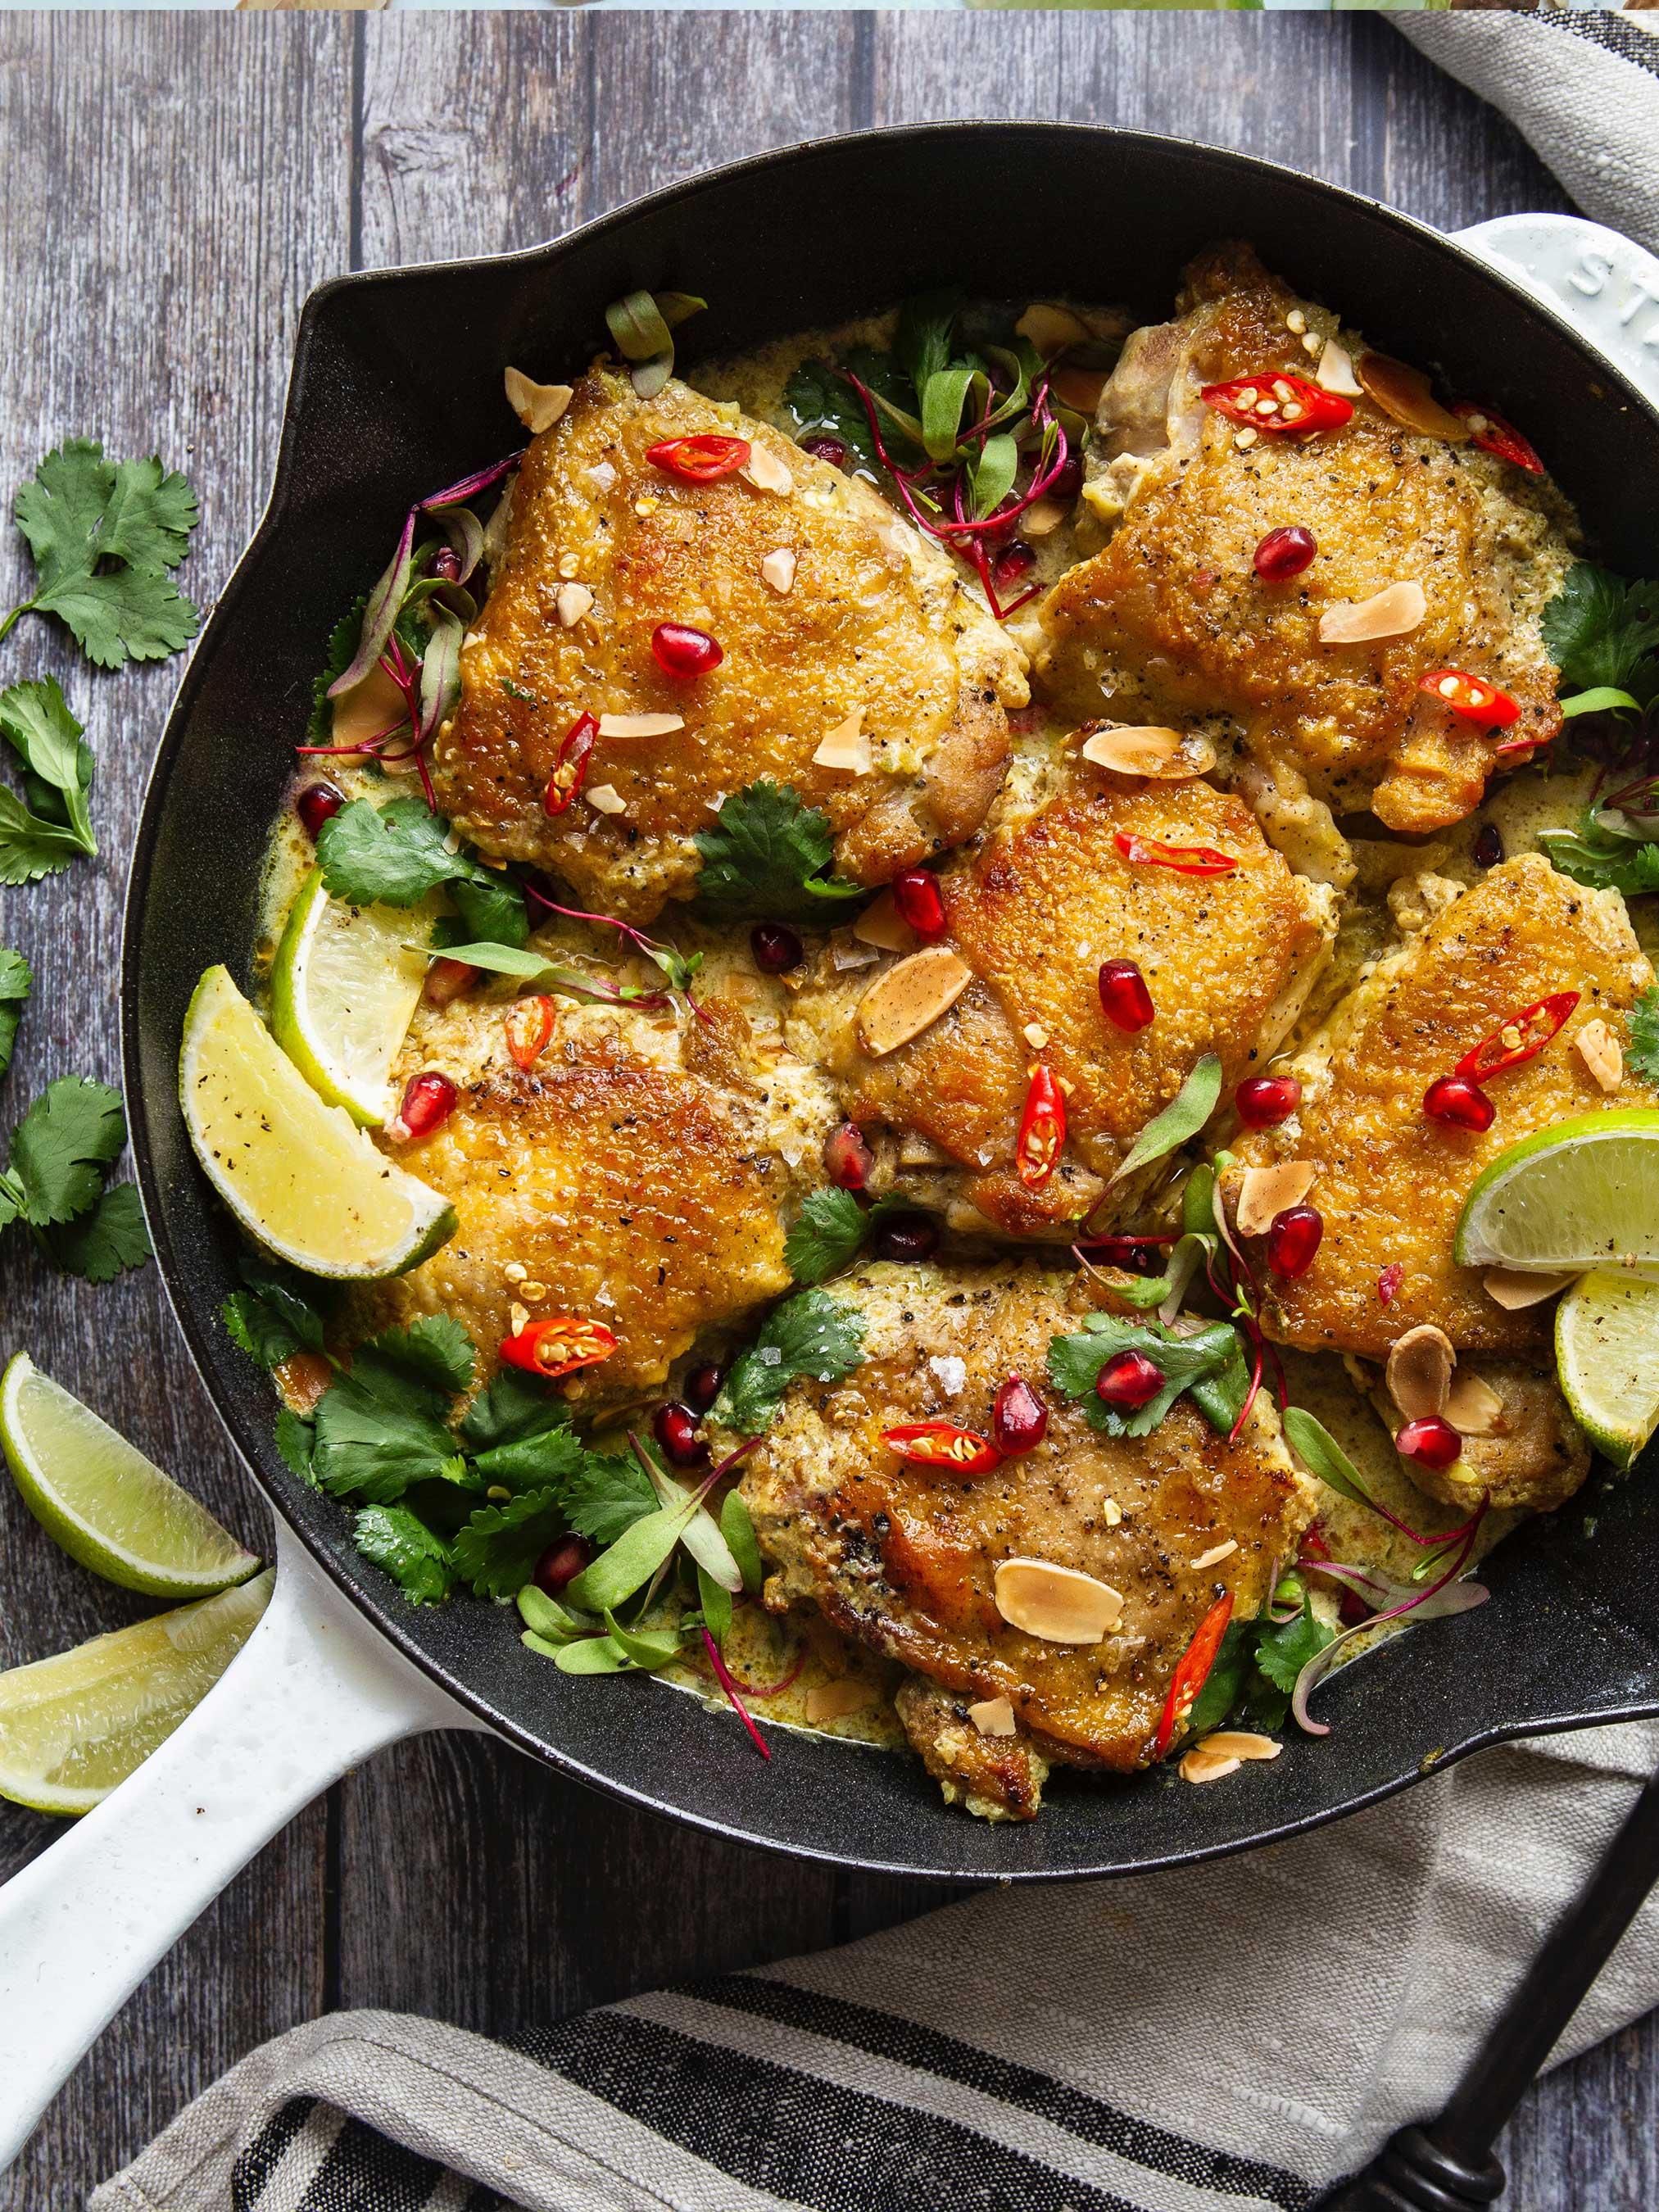 Crispy Chicken Thighs with Almond Milk Curry